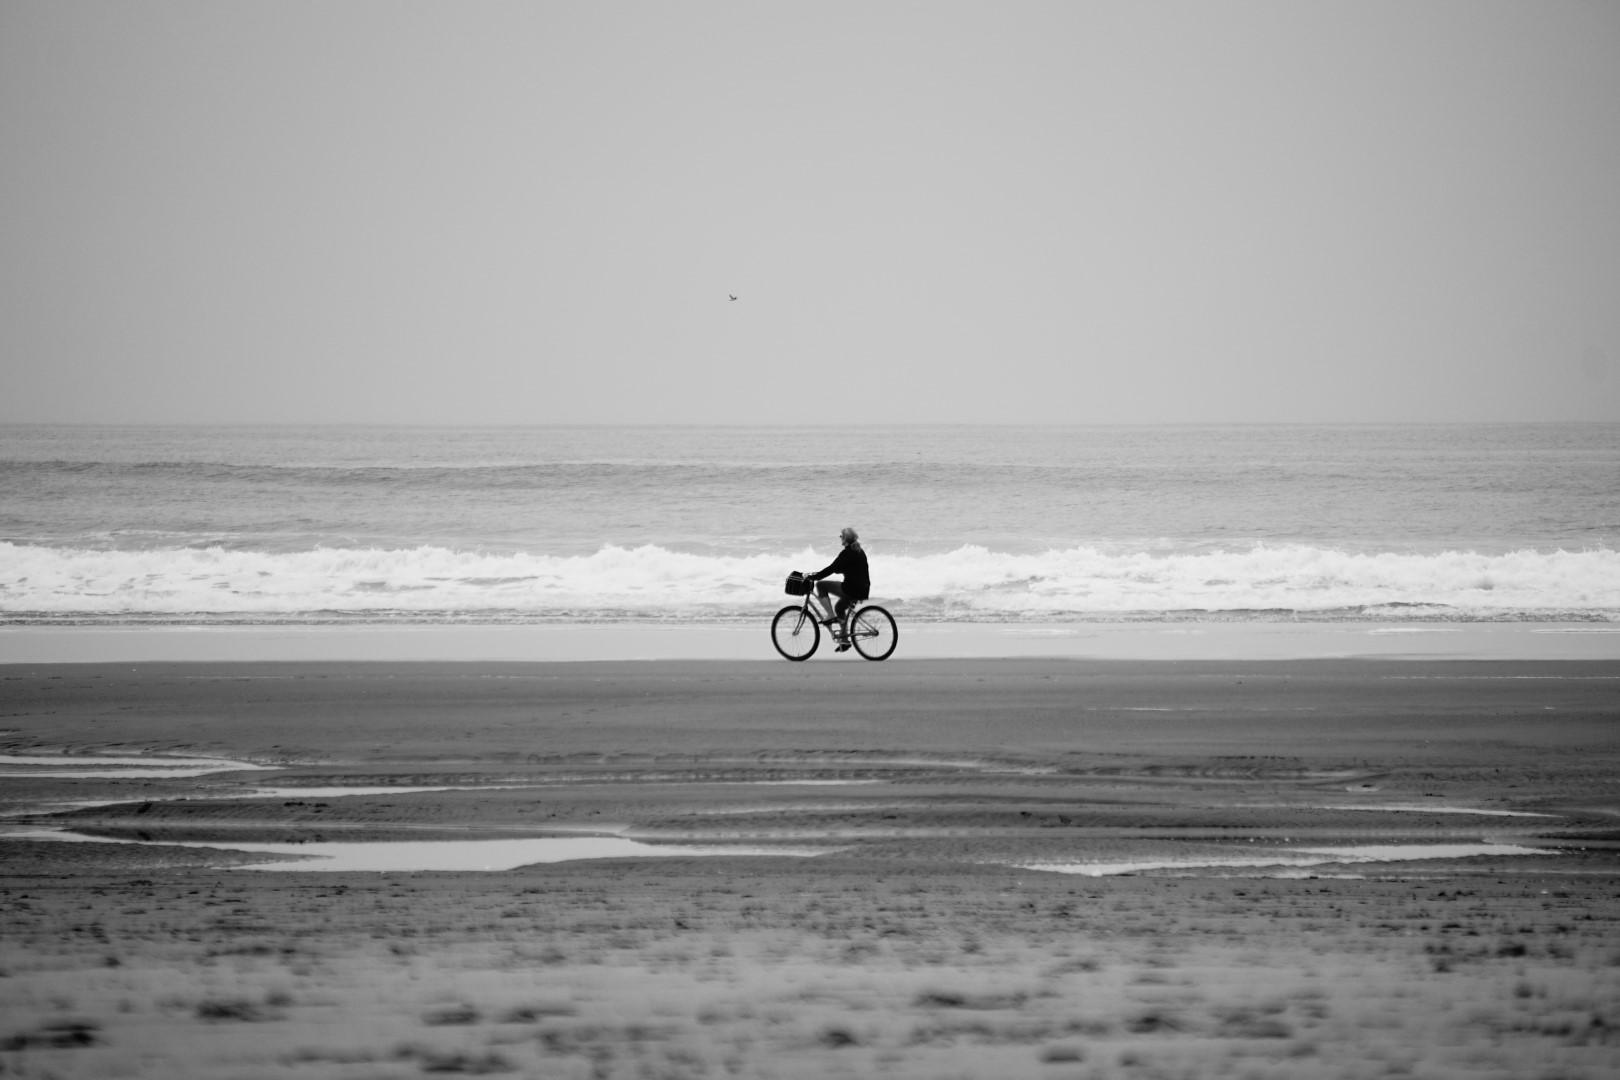 sand-drifter©2015seanhemak (Large).jpg